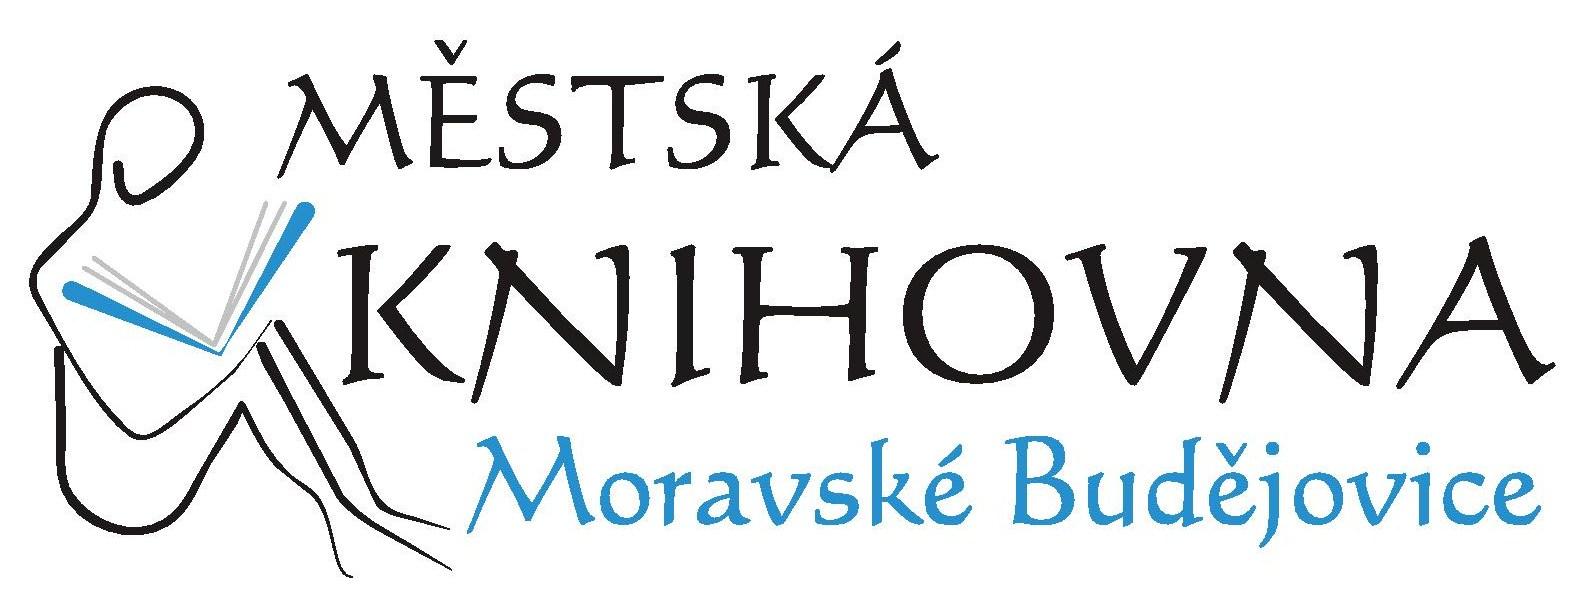 www.knihovnamb.cz